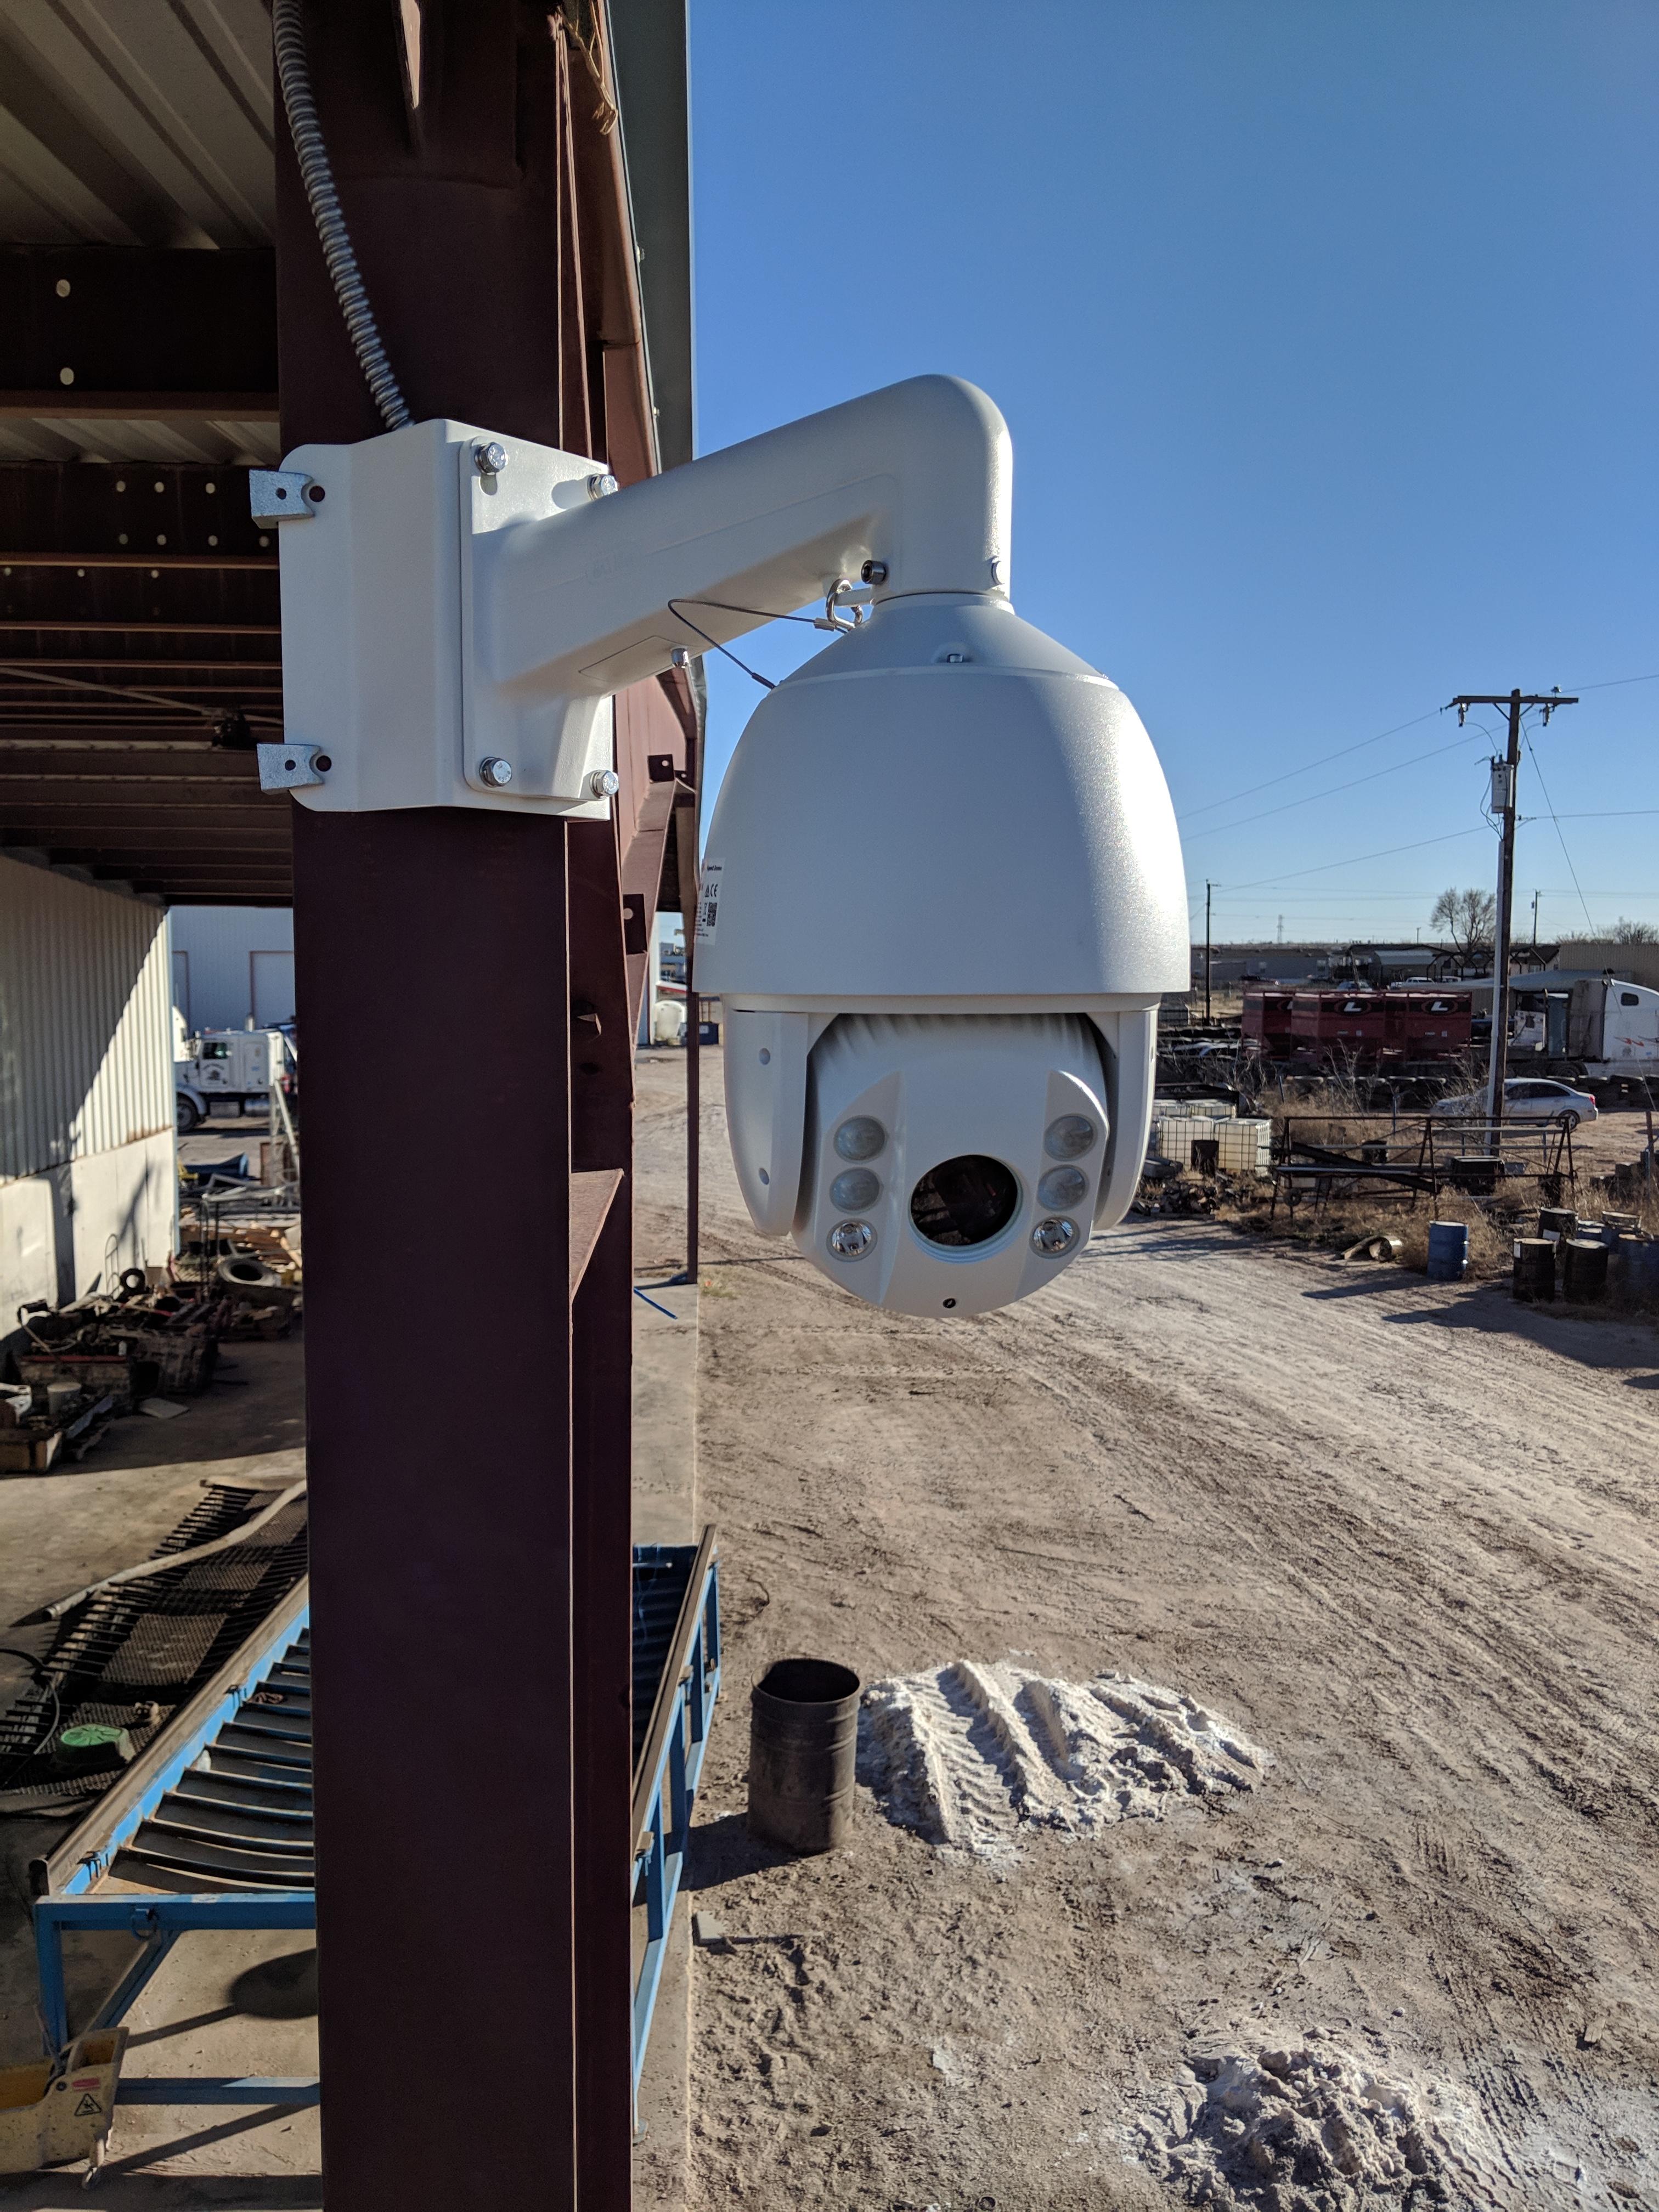 cloud  access cloud video texas houston local alarm security alarm cameras cameras system